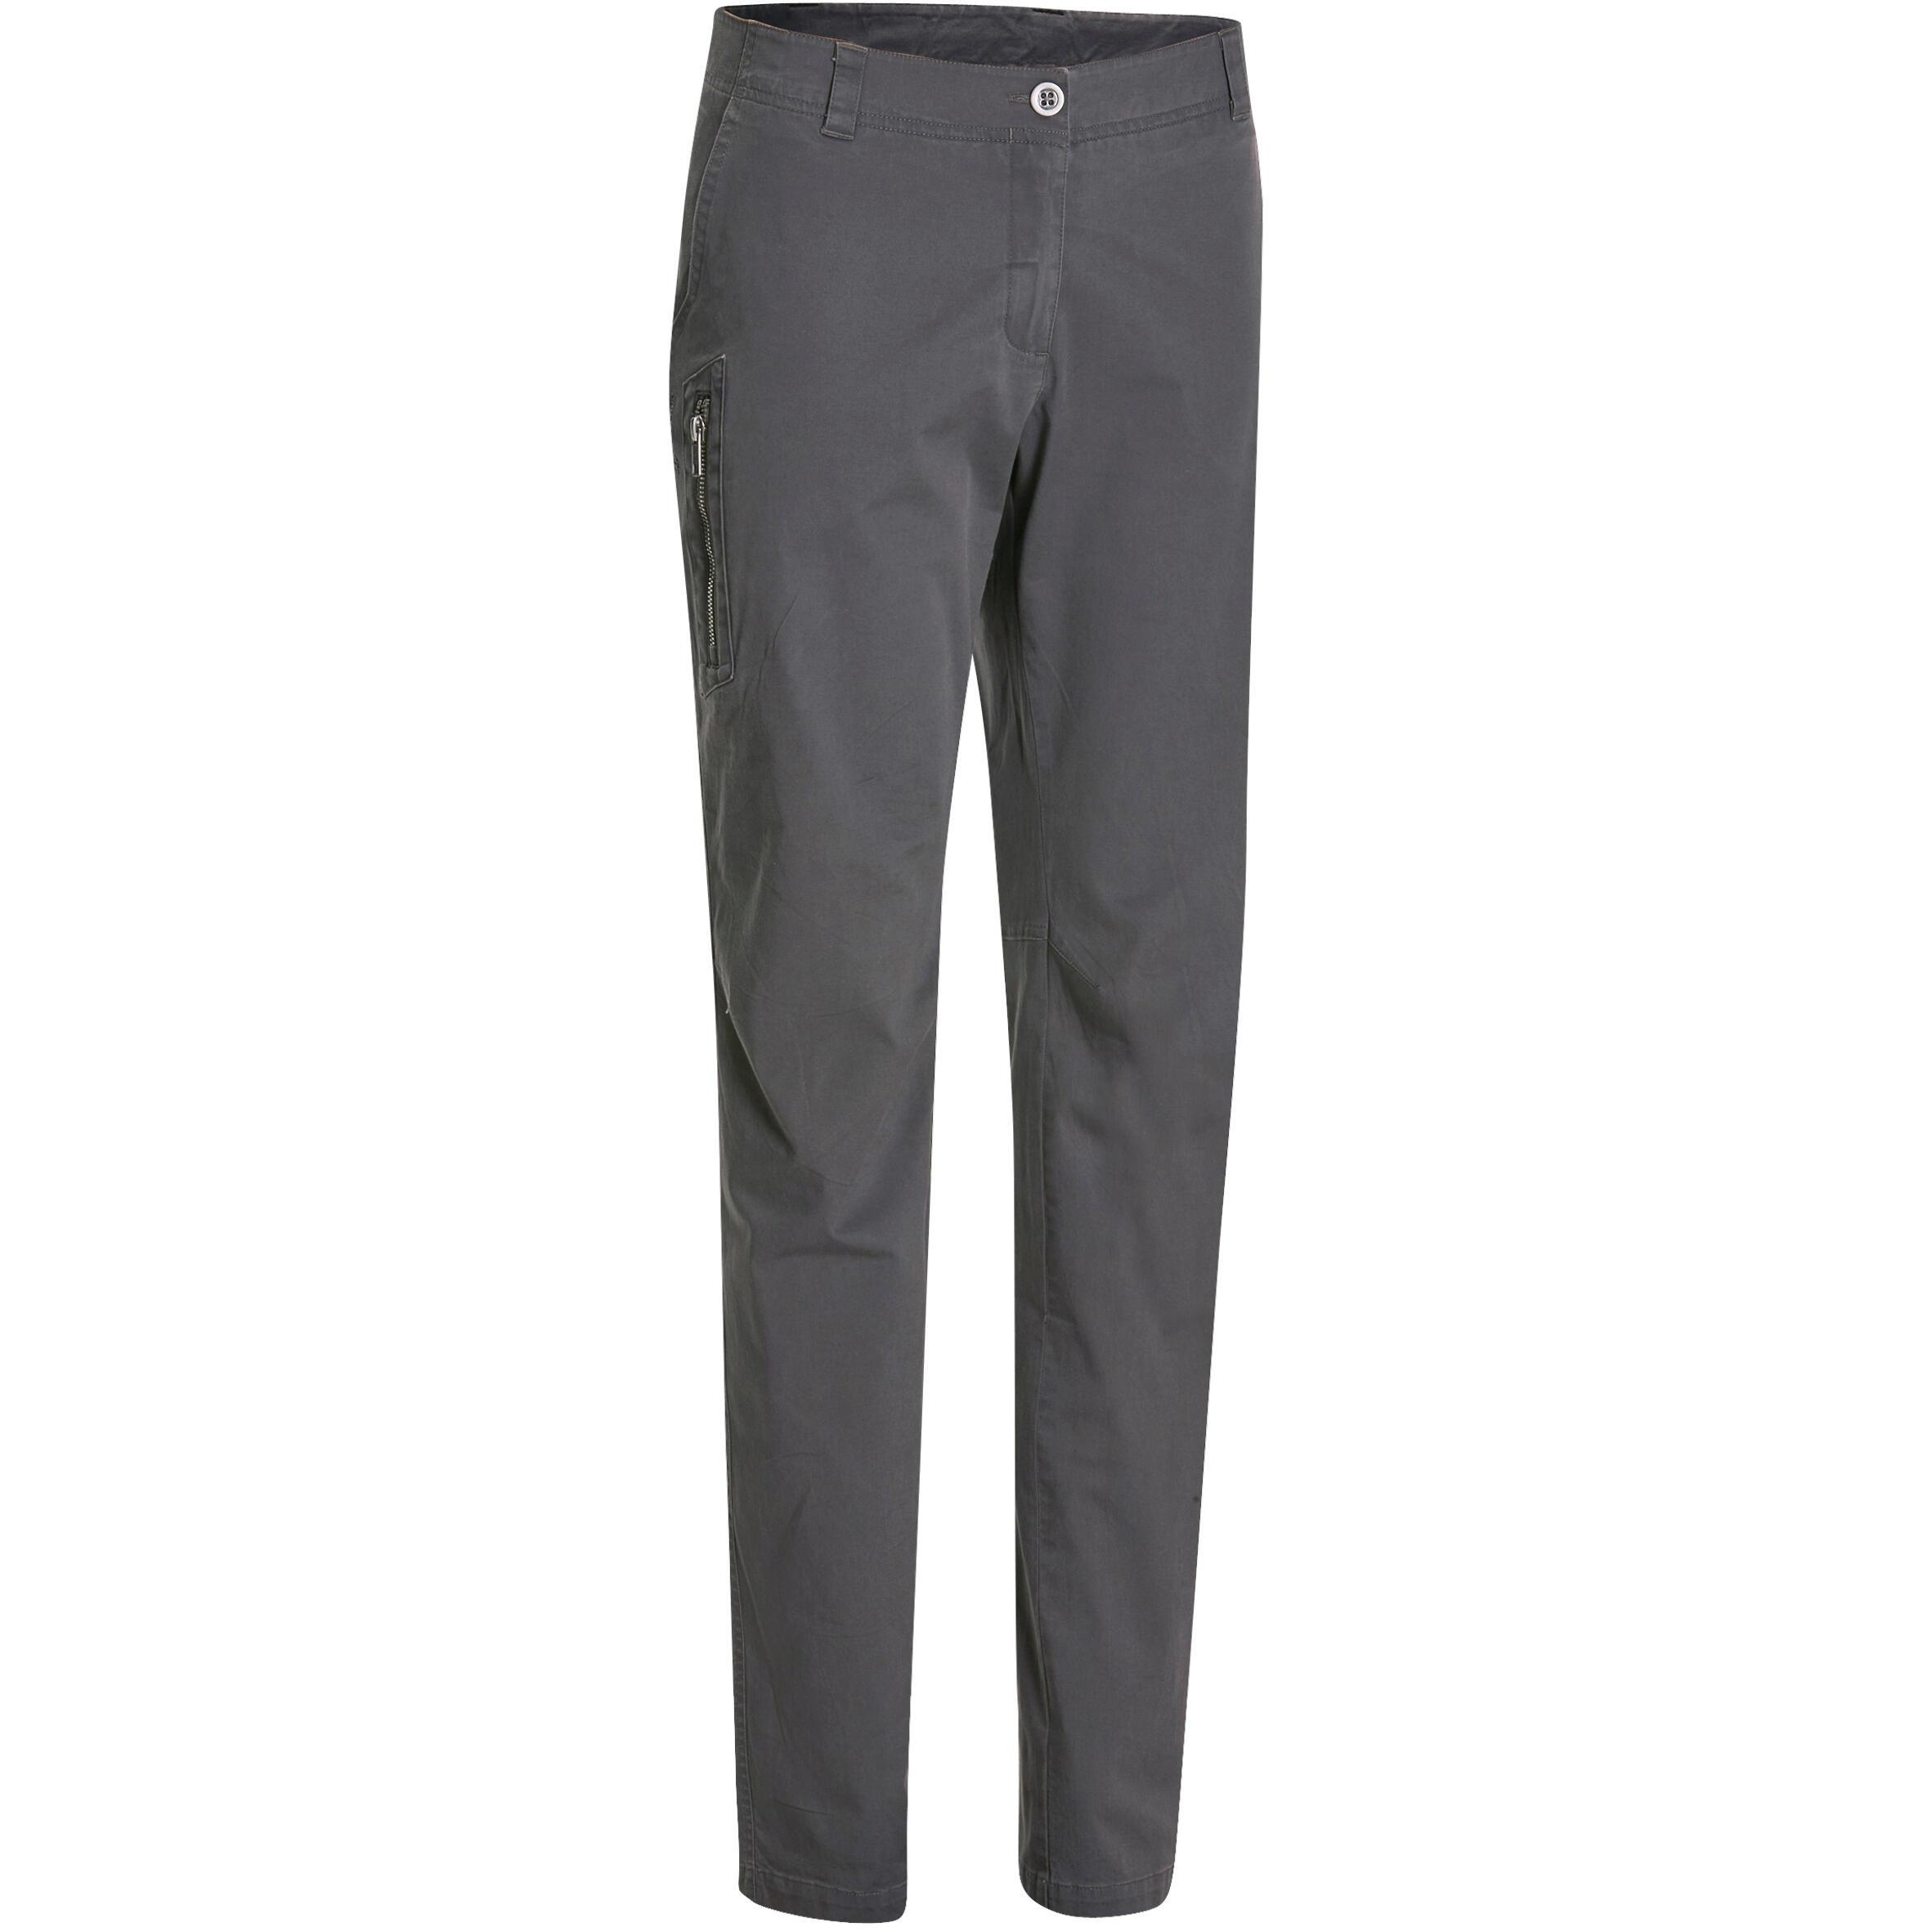 NH500 Women's Nature Hiking Trousers - Grey